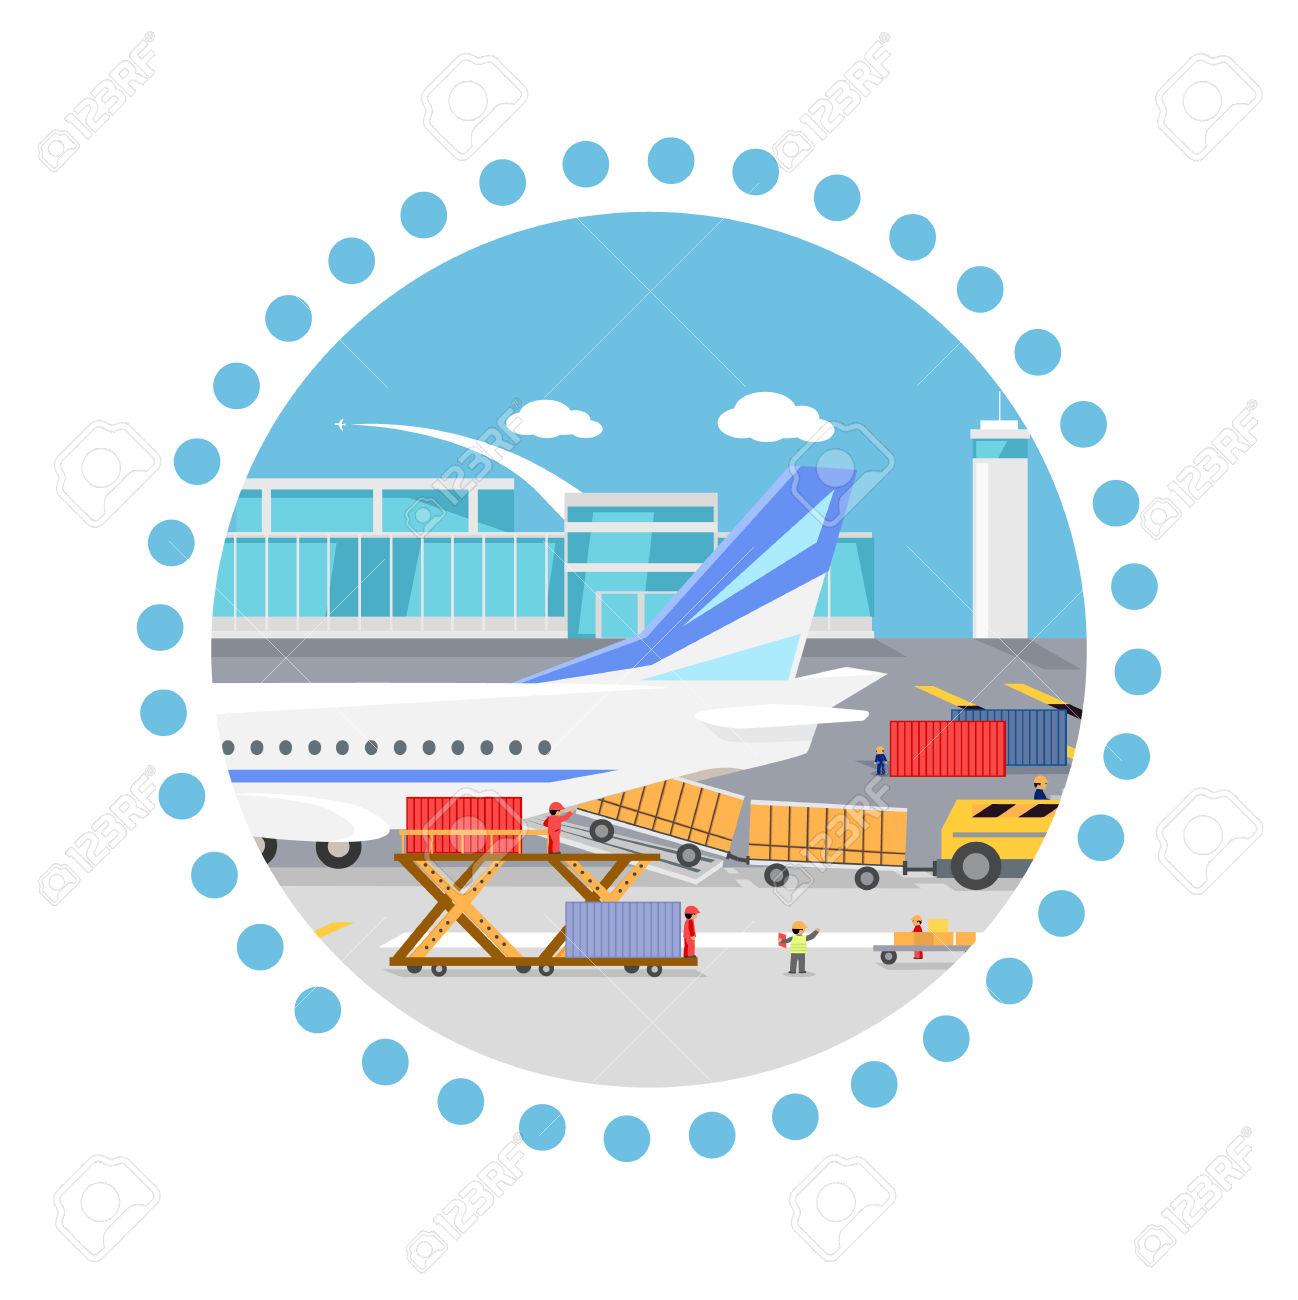 Distribution plane clipart. Clipartfest load loading